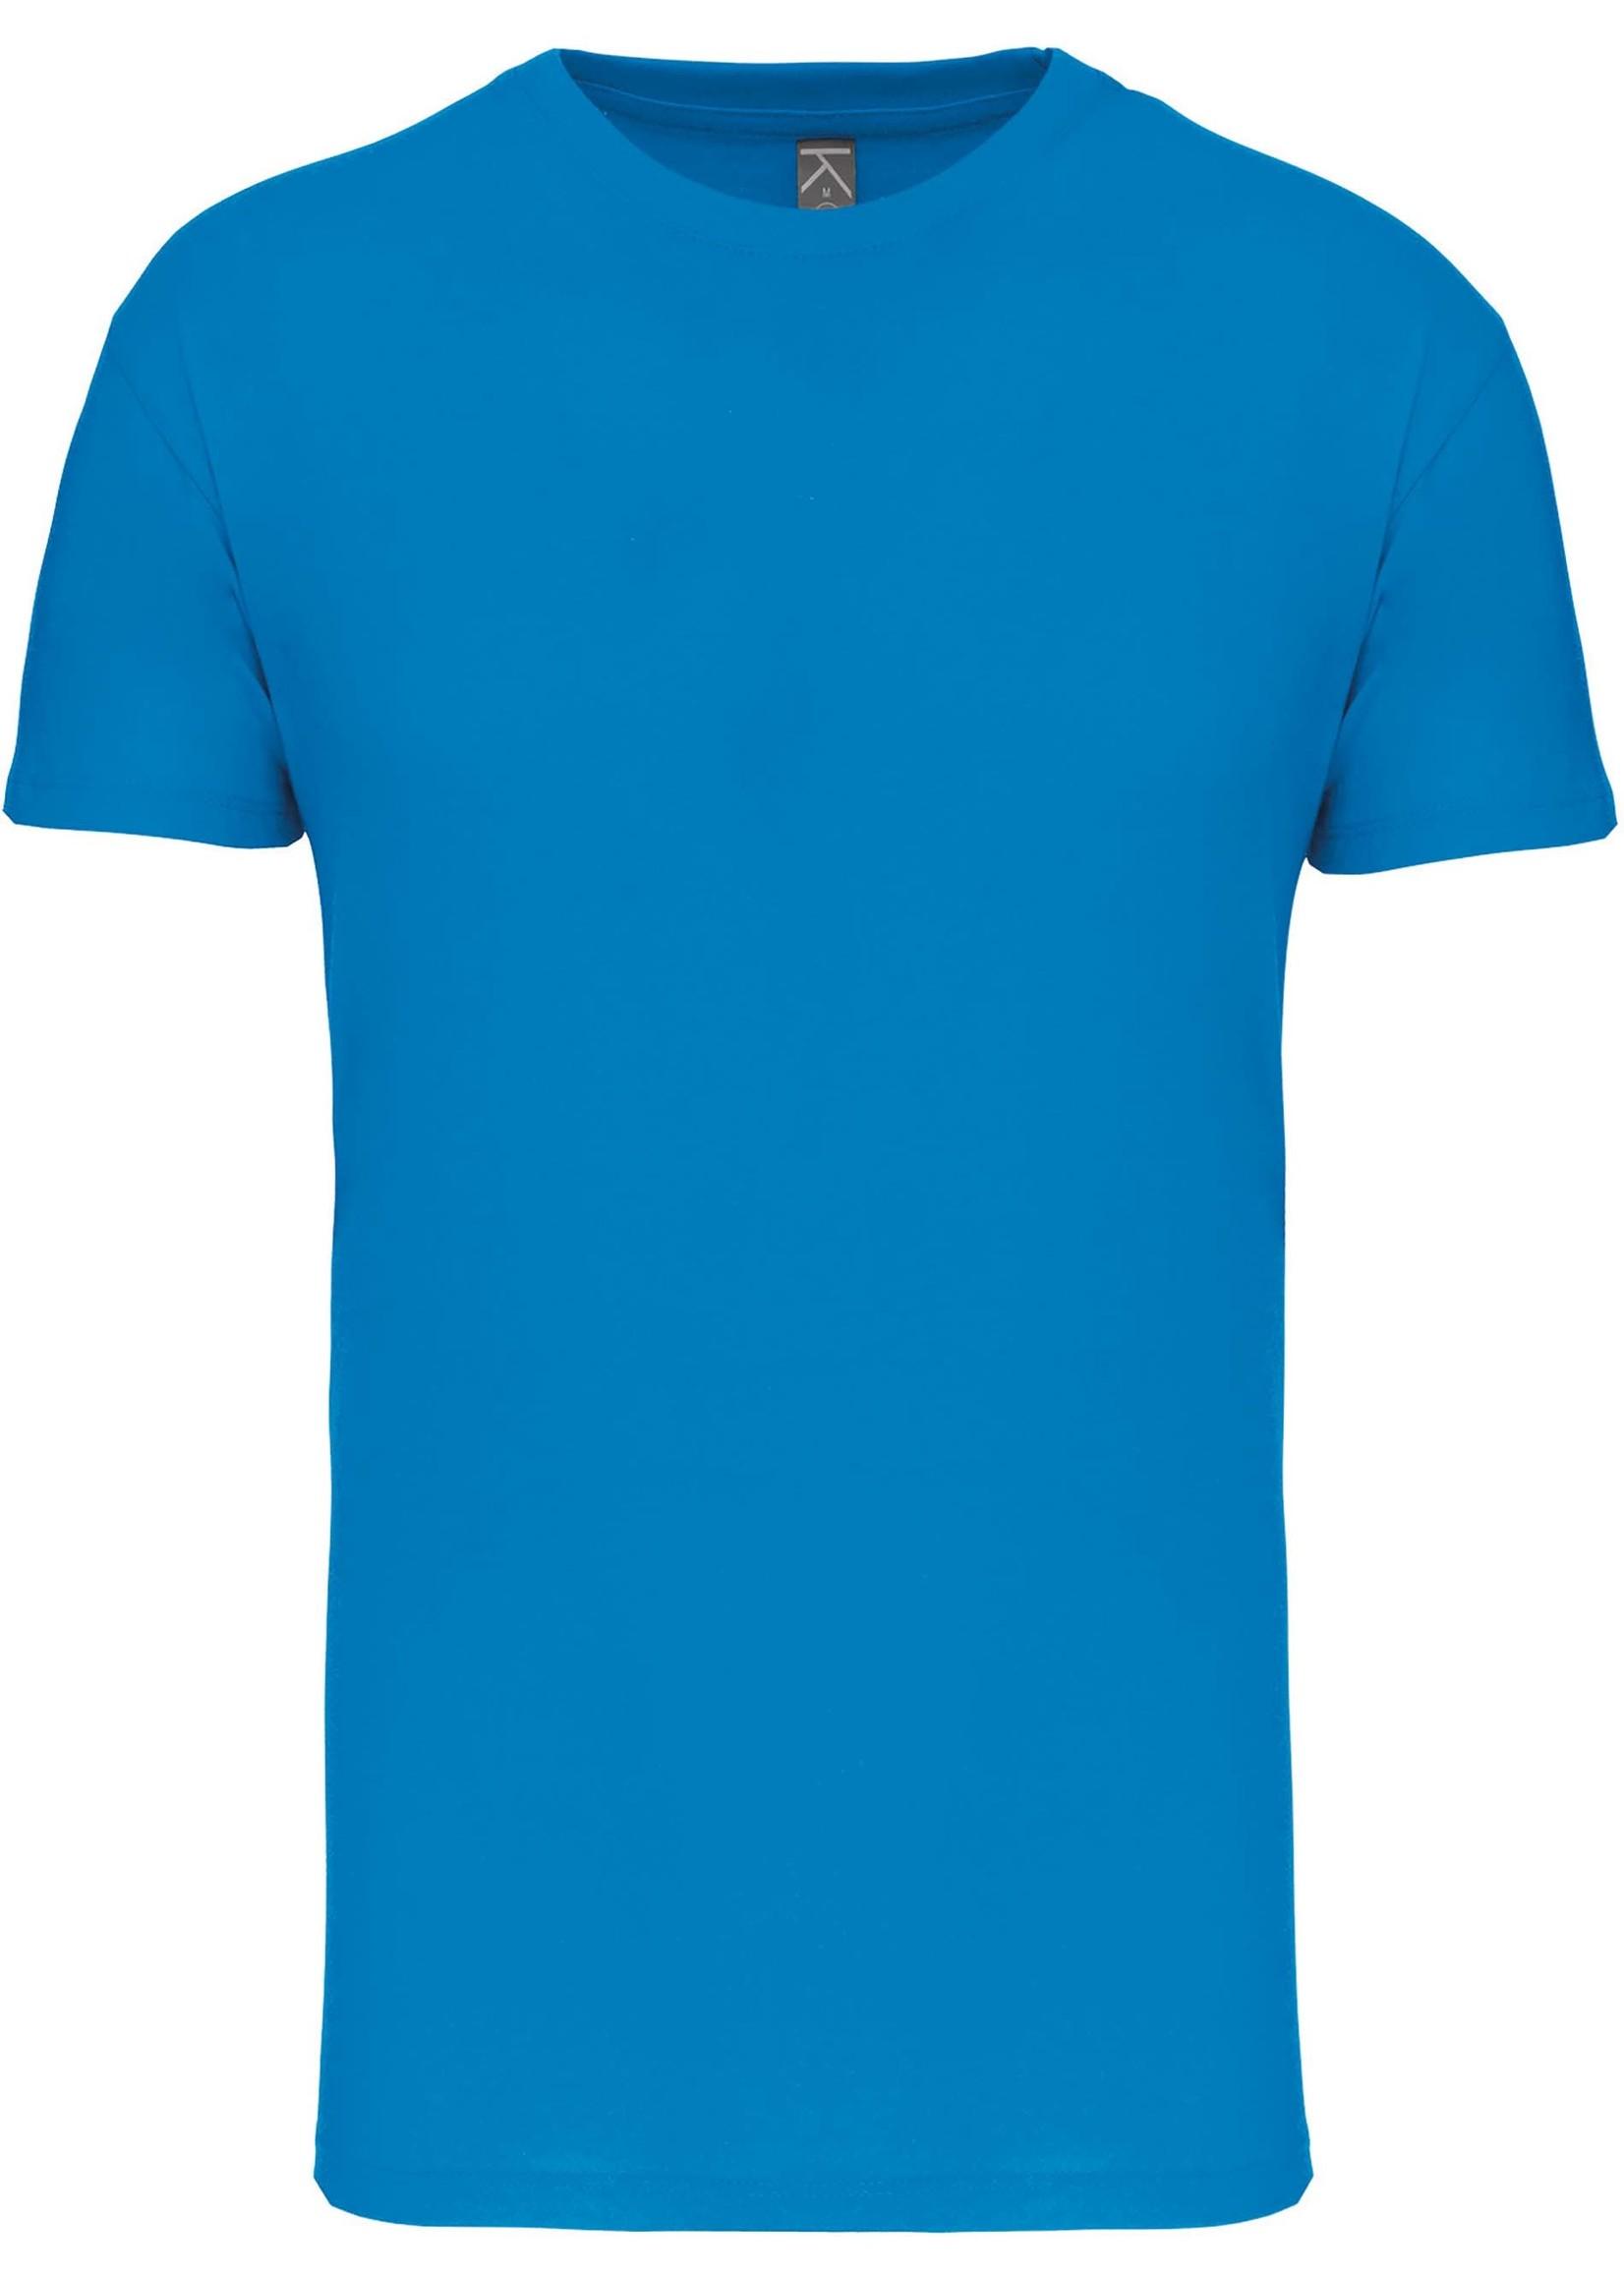 Eco-Friendly KIDS T-shirt - Tropicalblue